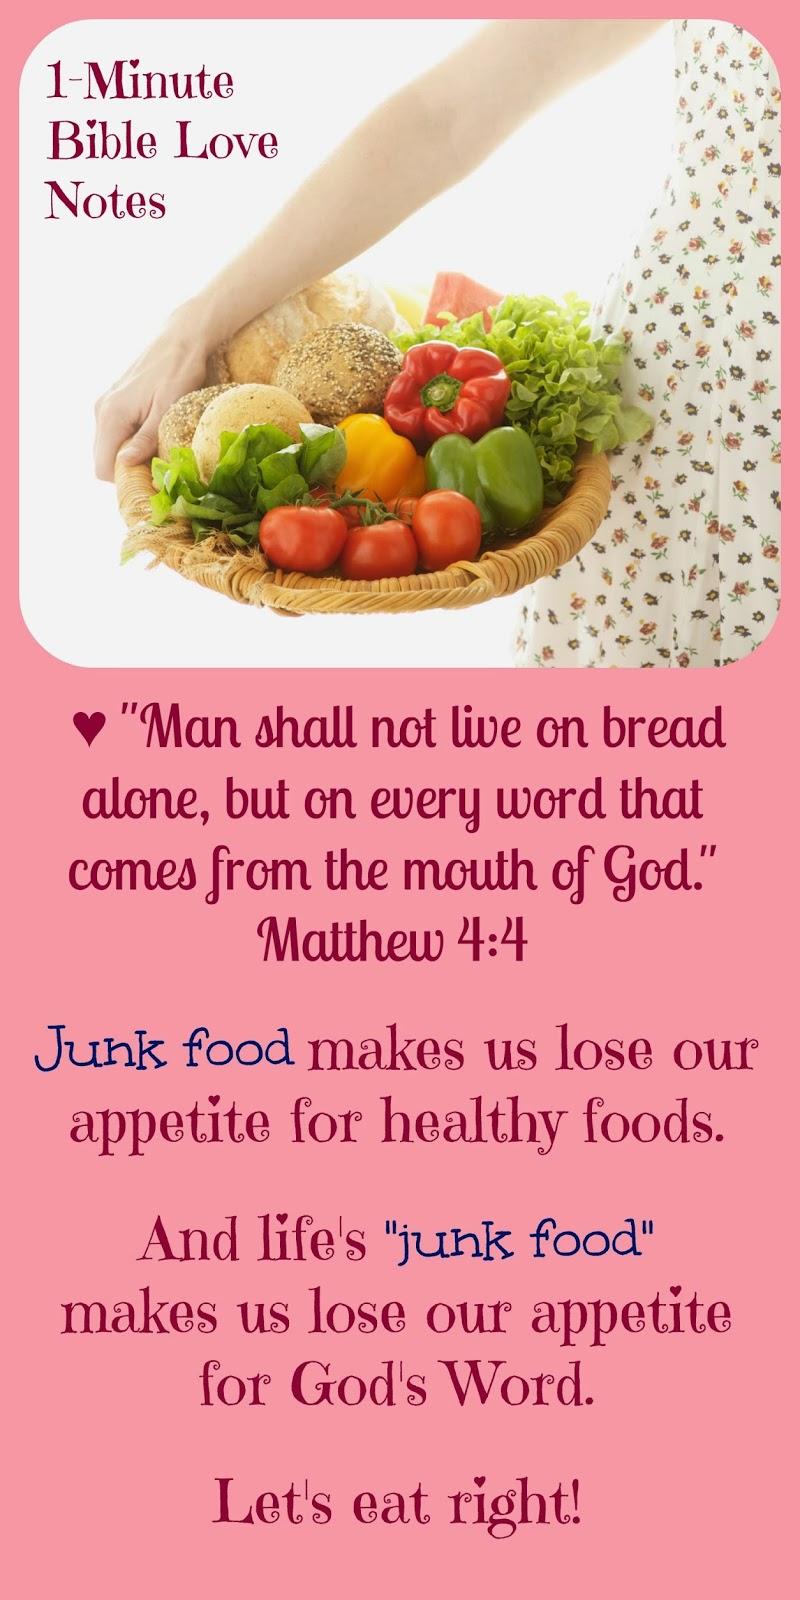 Matthew 4:4, God's Word, Eating right spiritually